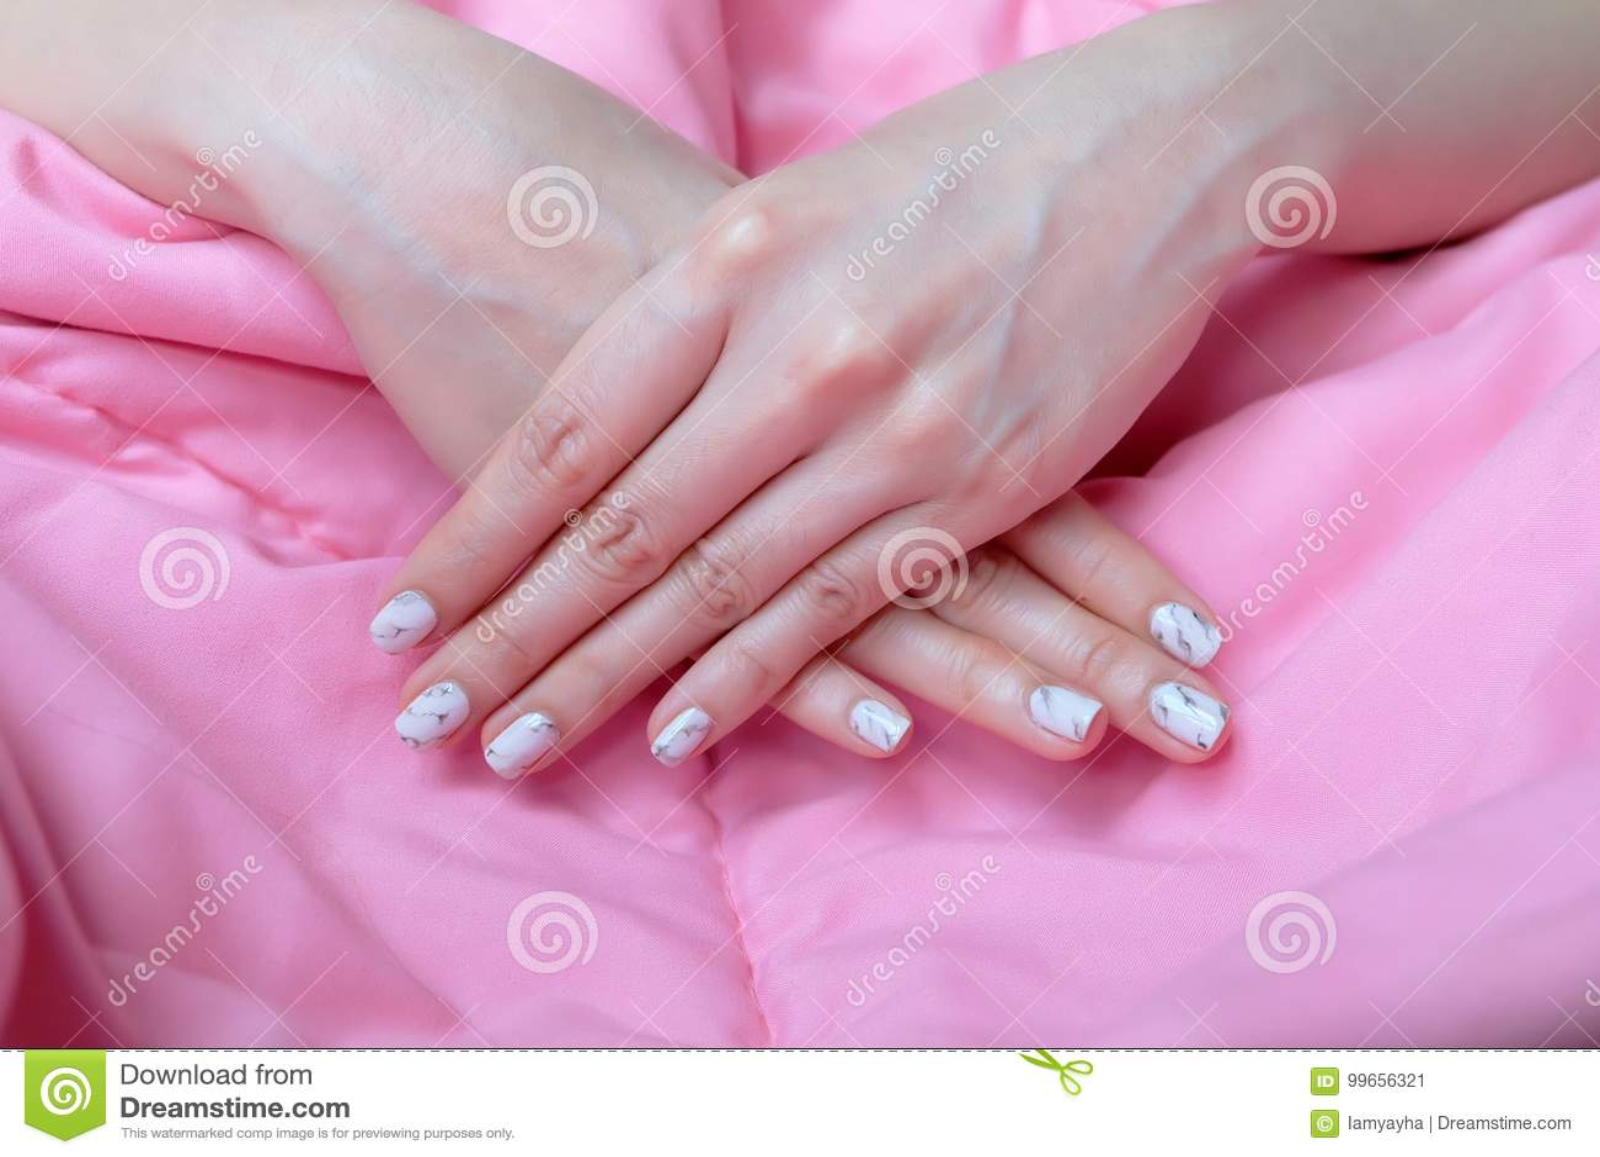 Granite Gray Nail. Close Up Nails Polish, Manicure Granite Gray Nail on Pink Blanket Background